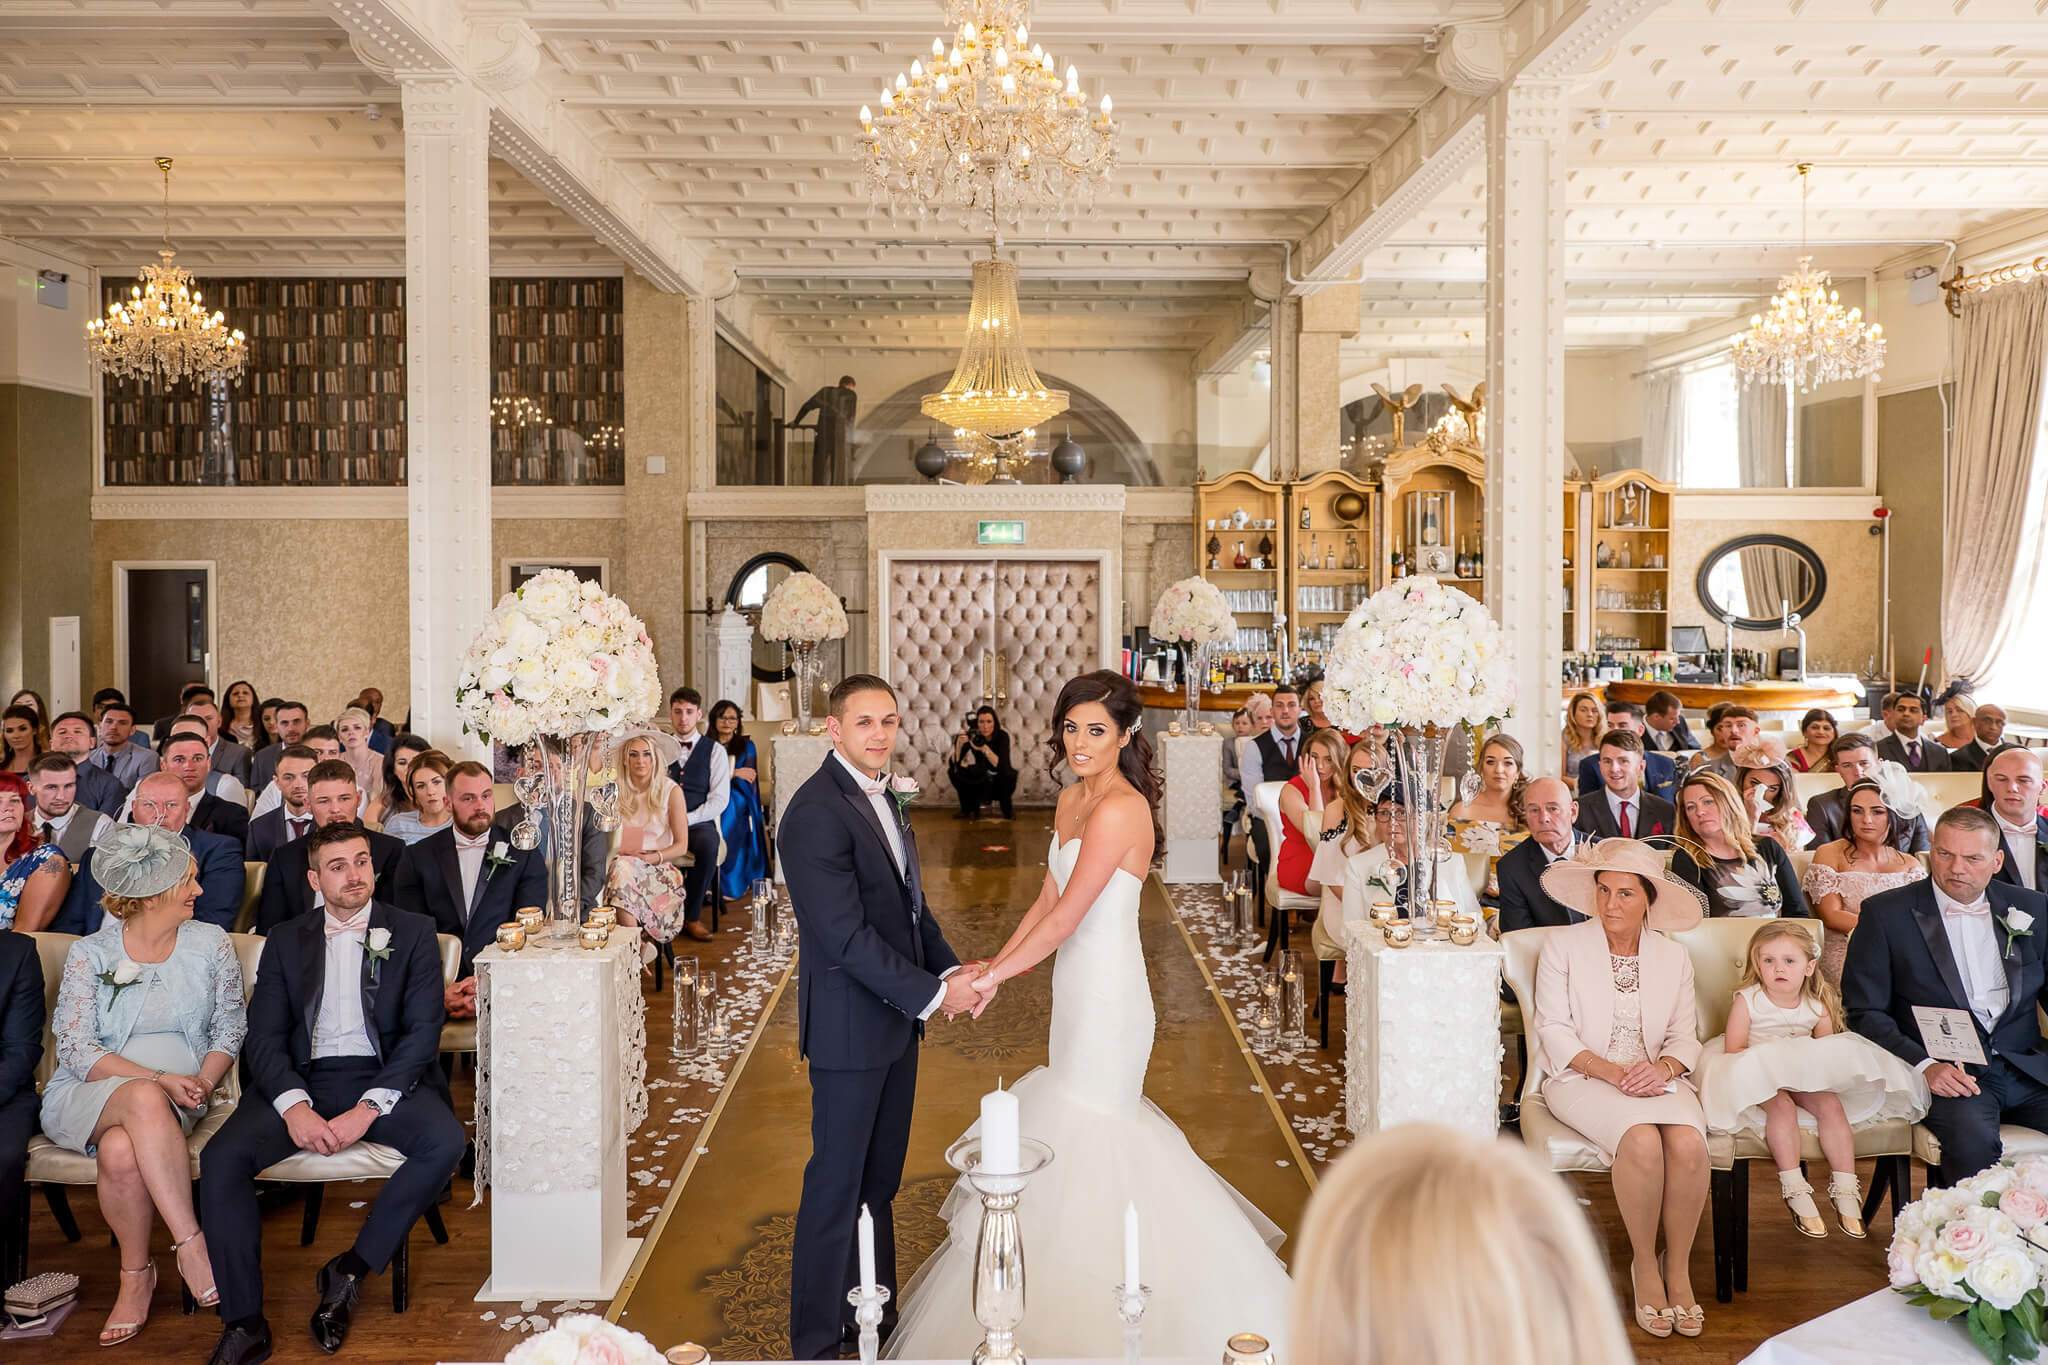 30-james-street-wedding-ceremony-bride-groom-liverpool